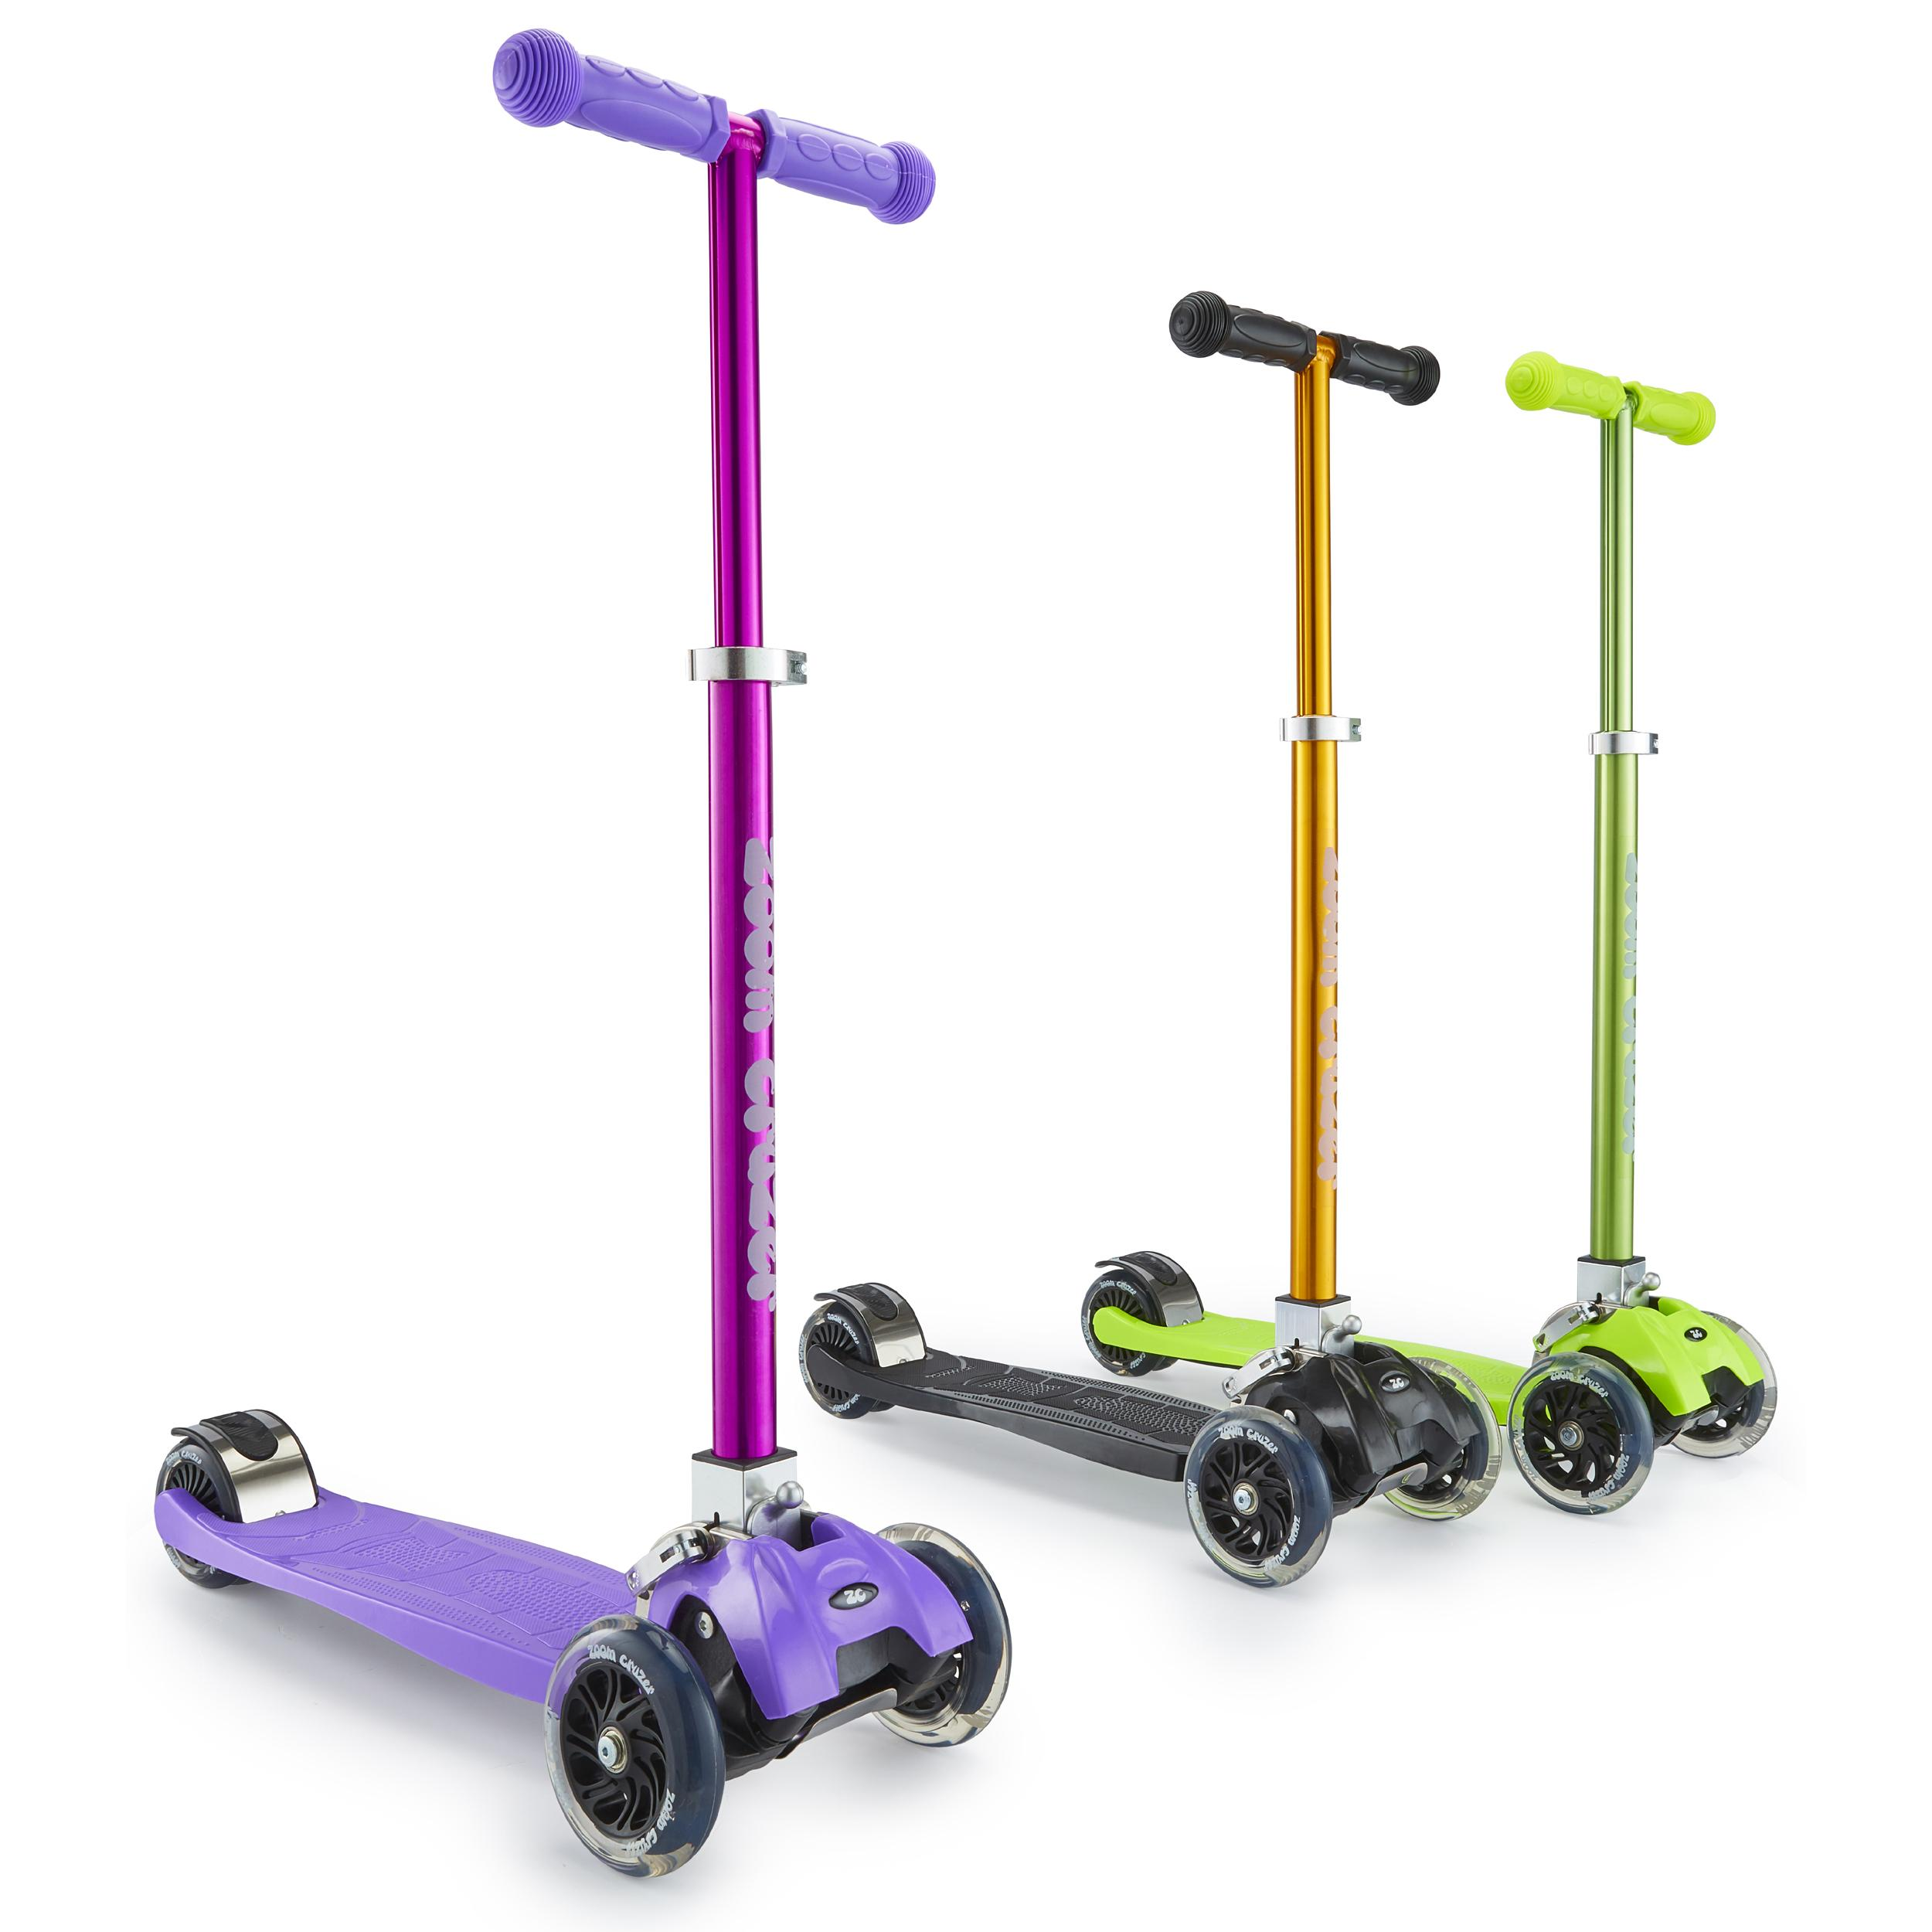 Zoom Cruzer Girls 3 Wheel Micro Scooter Purple For